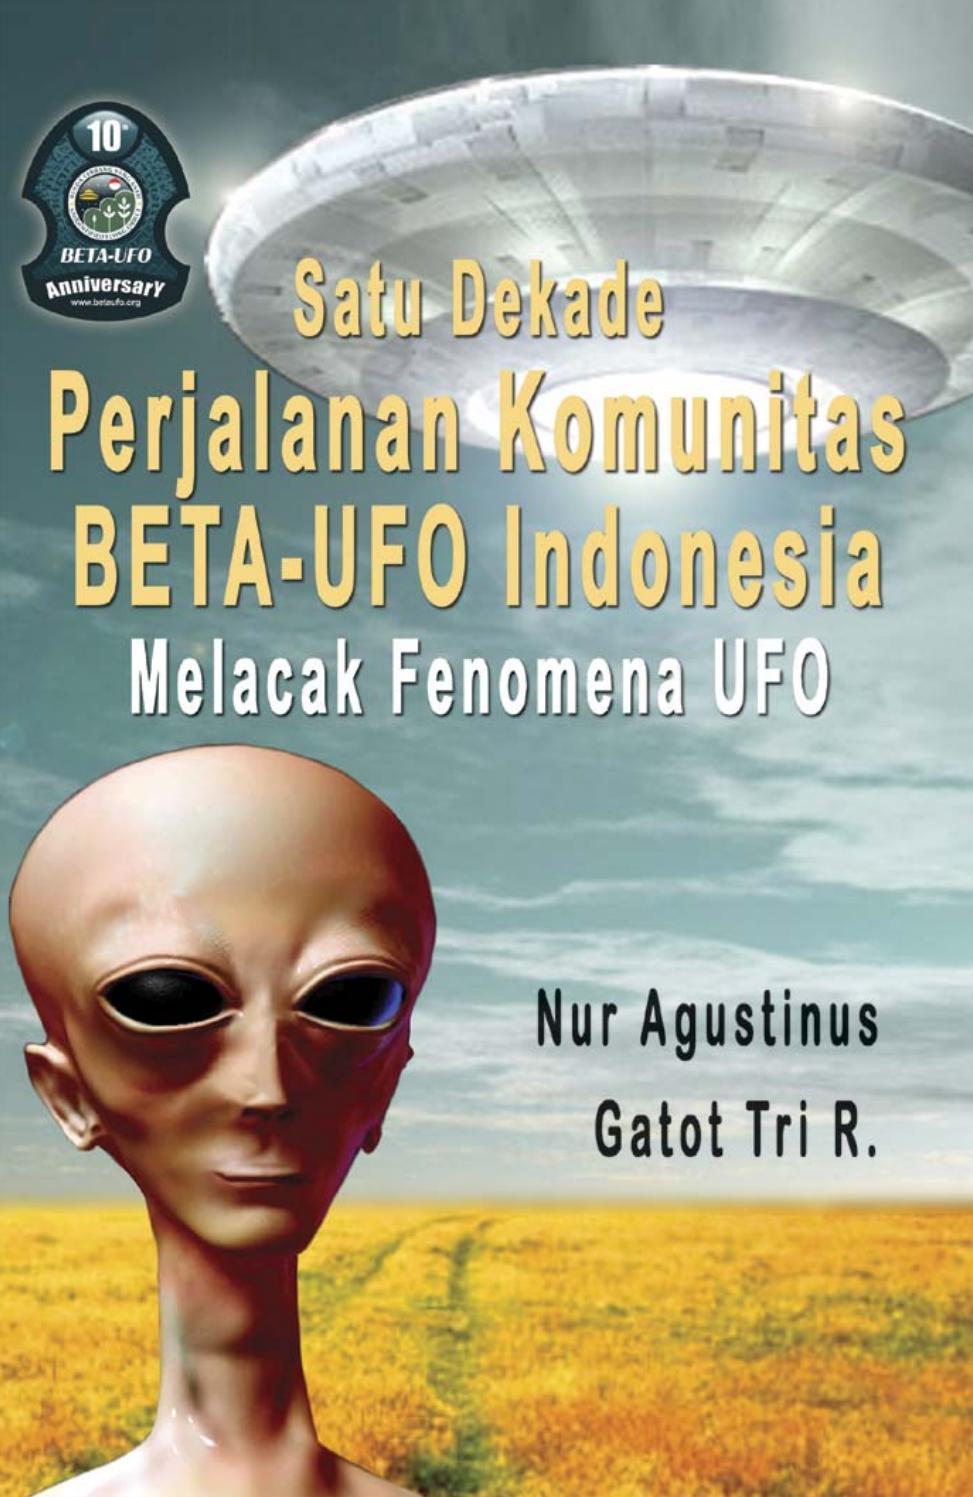 Satu Dekade BETA-UFO melacak fenomena UFO (2007) by pratidina - issuu 64c562c57c